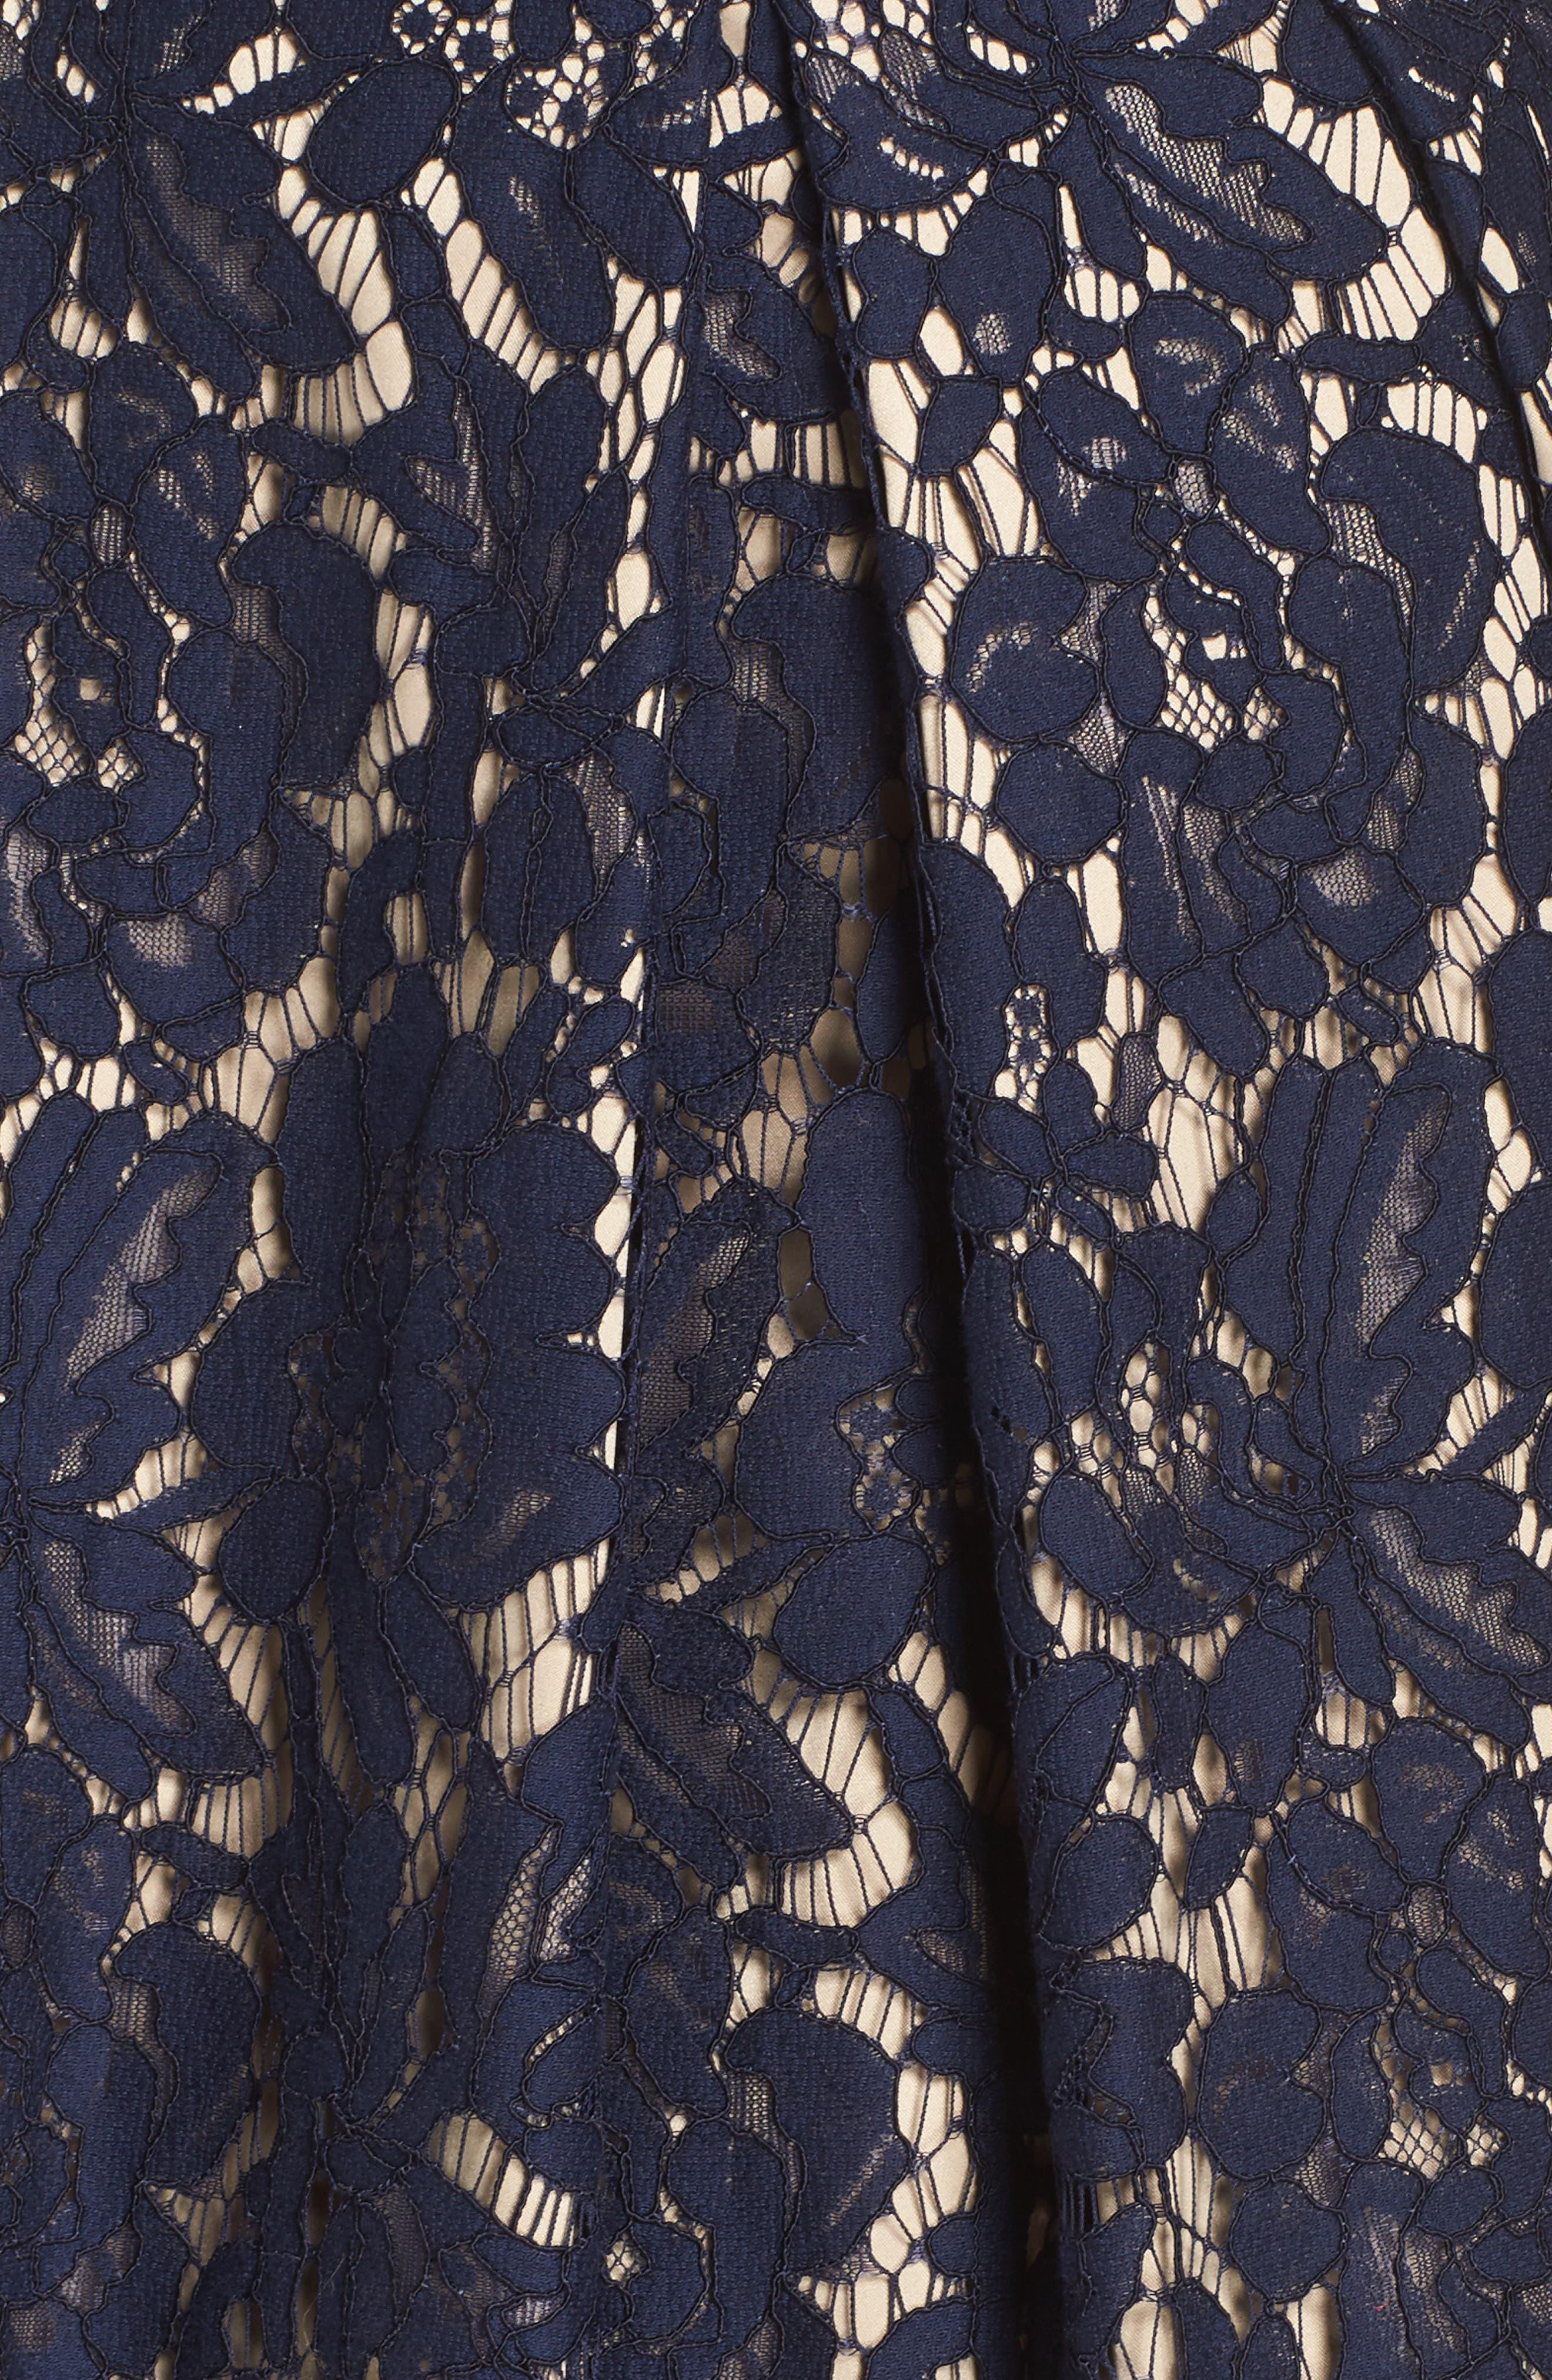 Embellished Lace Fit & Flare Dress,                             Alternate thumbnail 5, color,                             NAVY